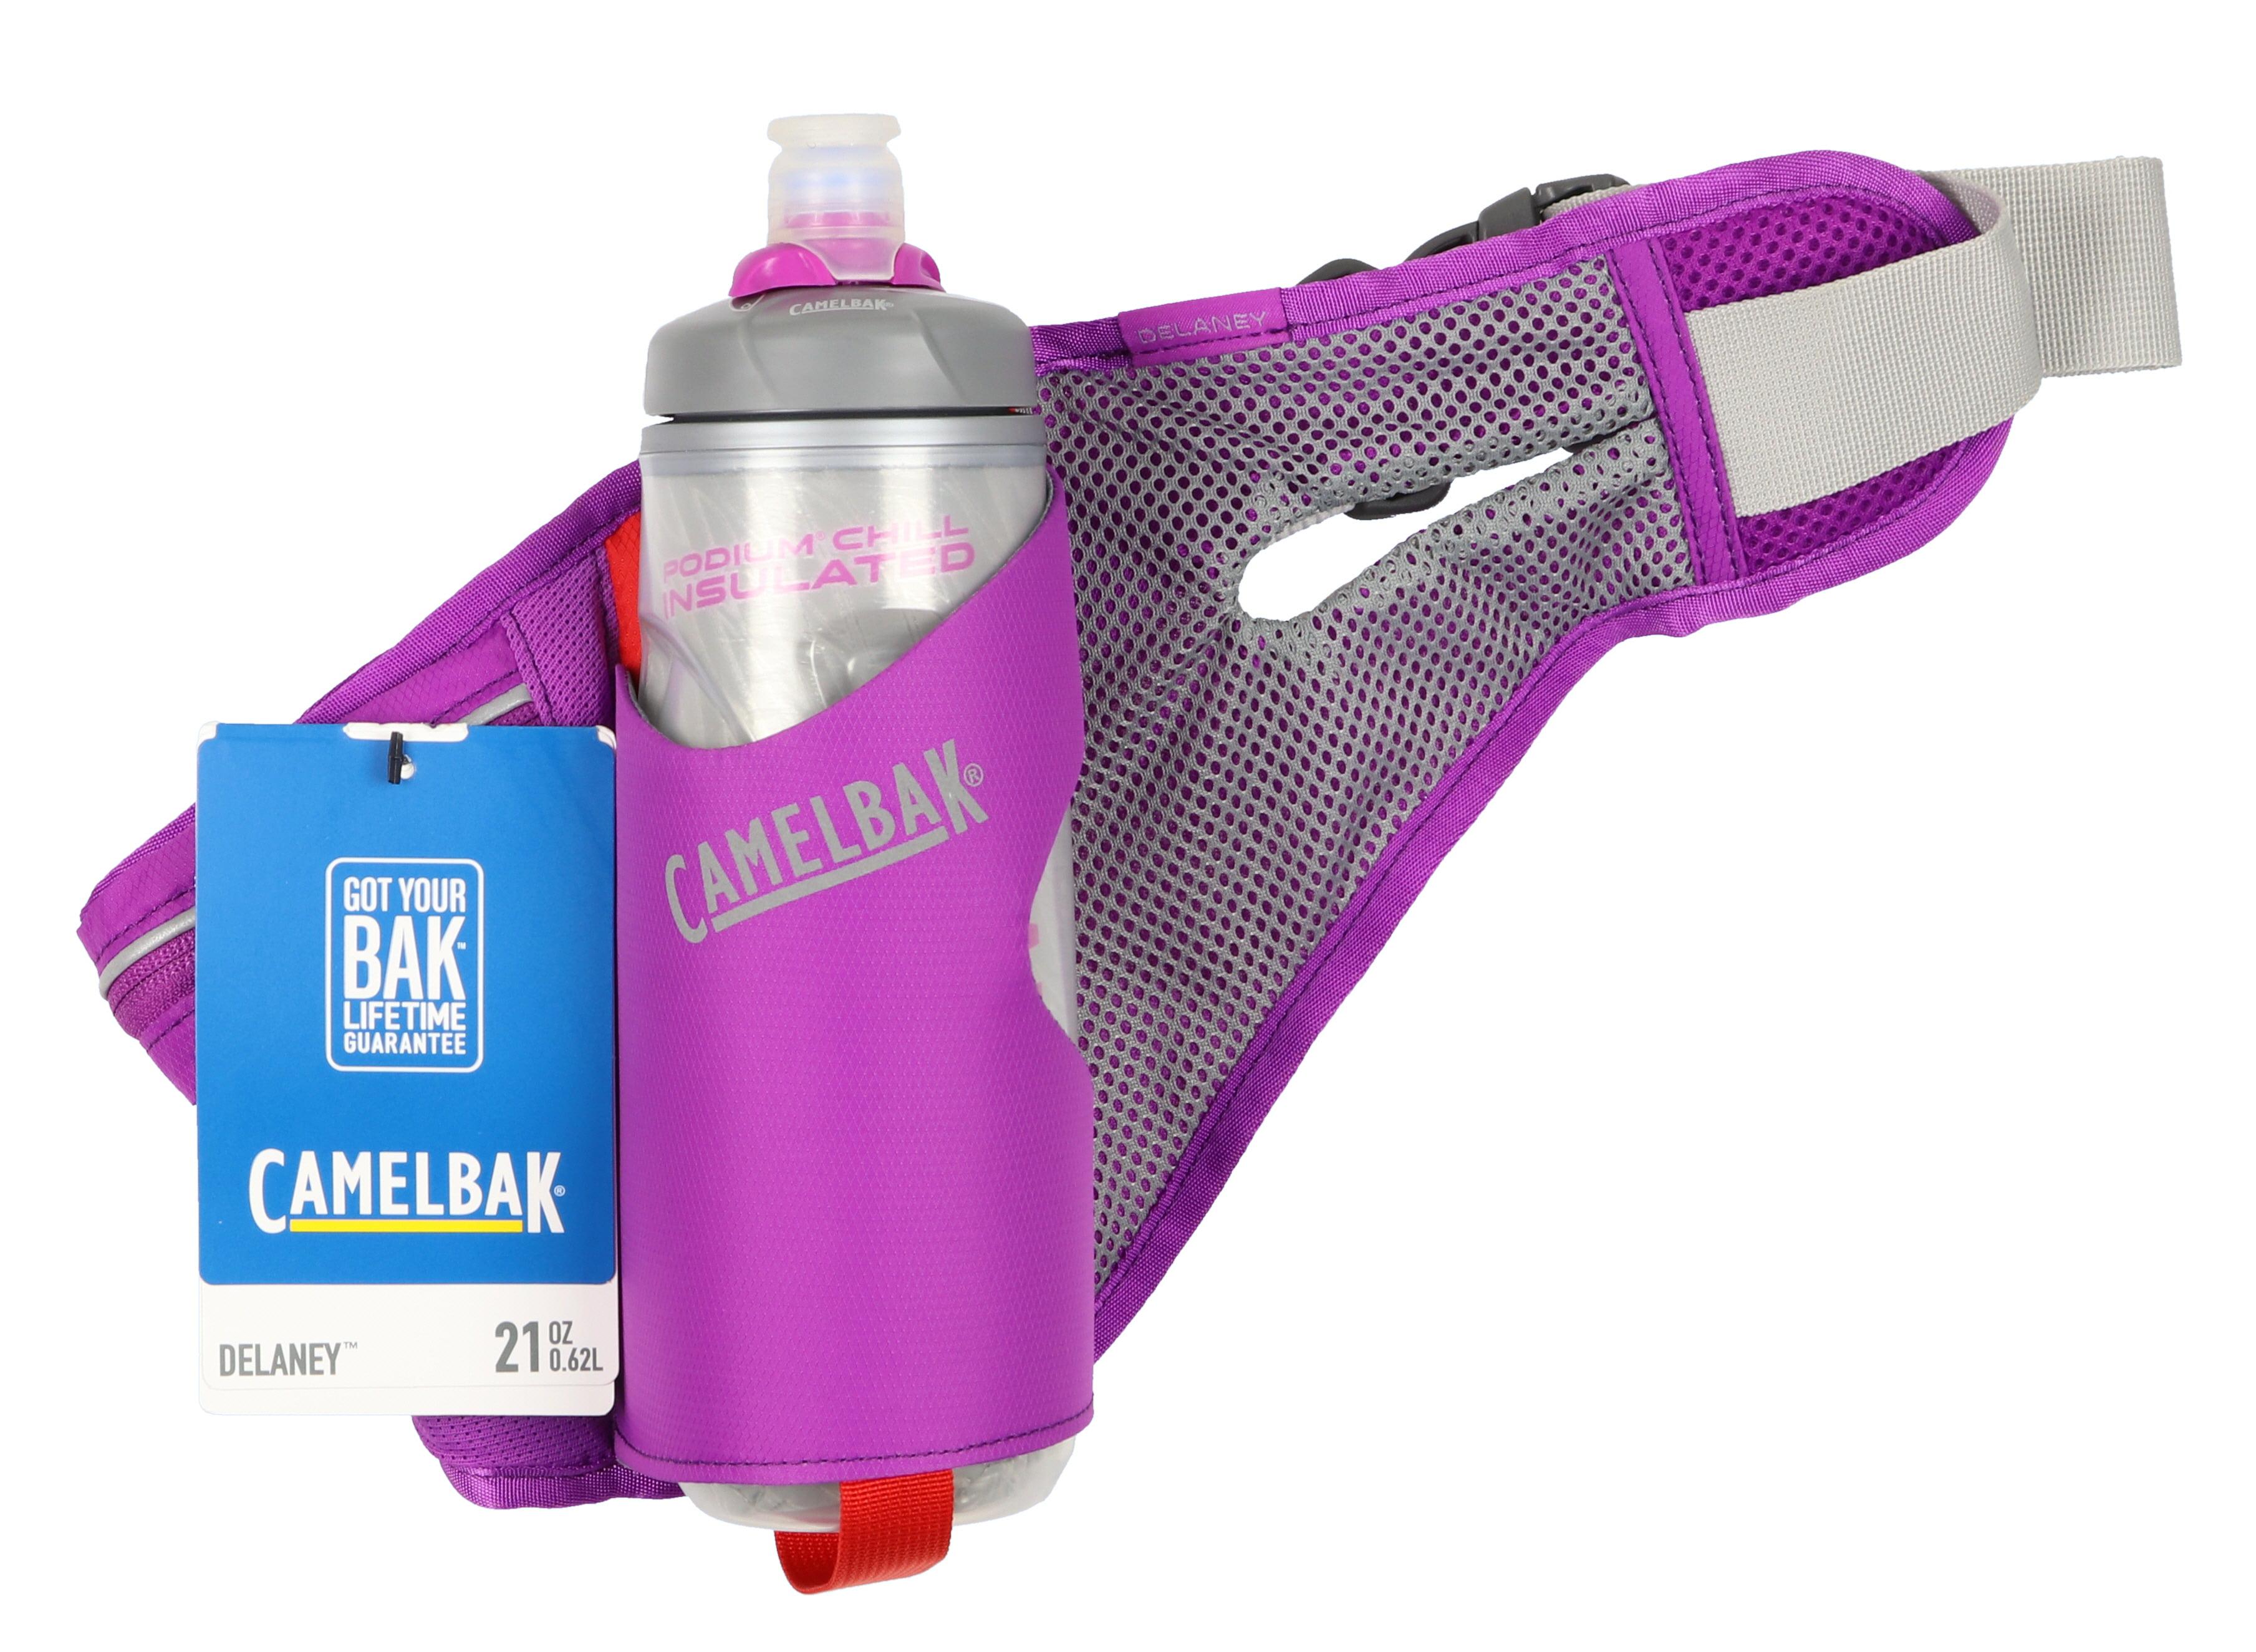 Camelbak Women's Delaney 21 oz Water Hydration Waistpack Purple Gray by CamelBak